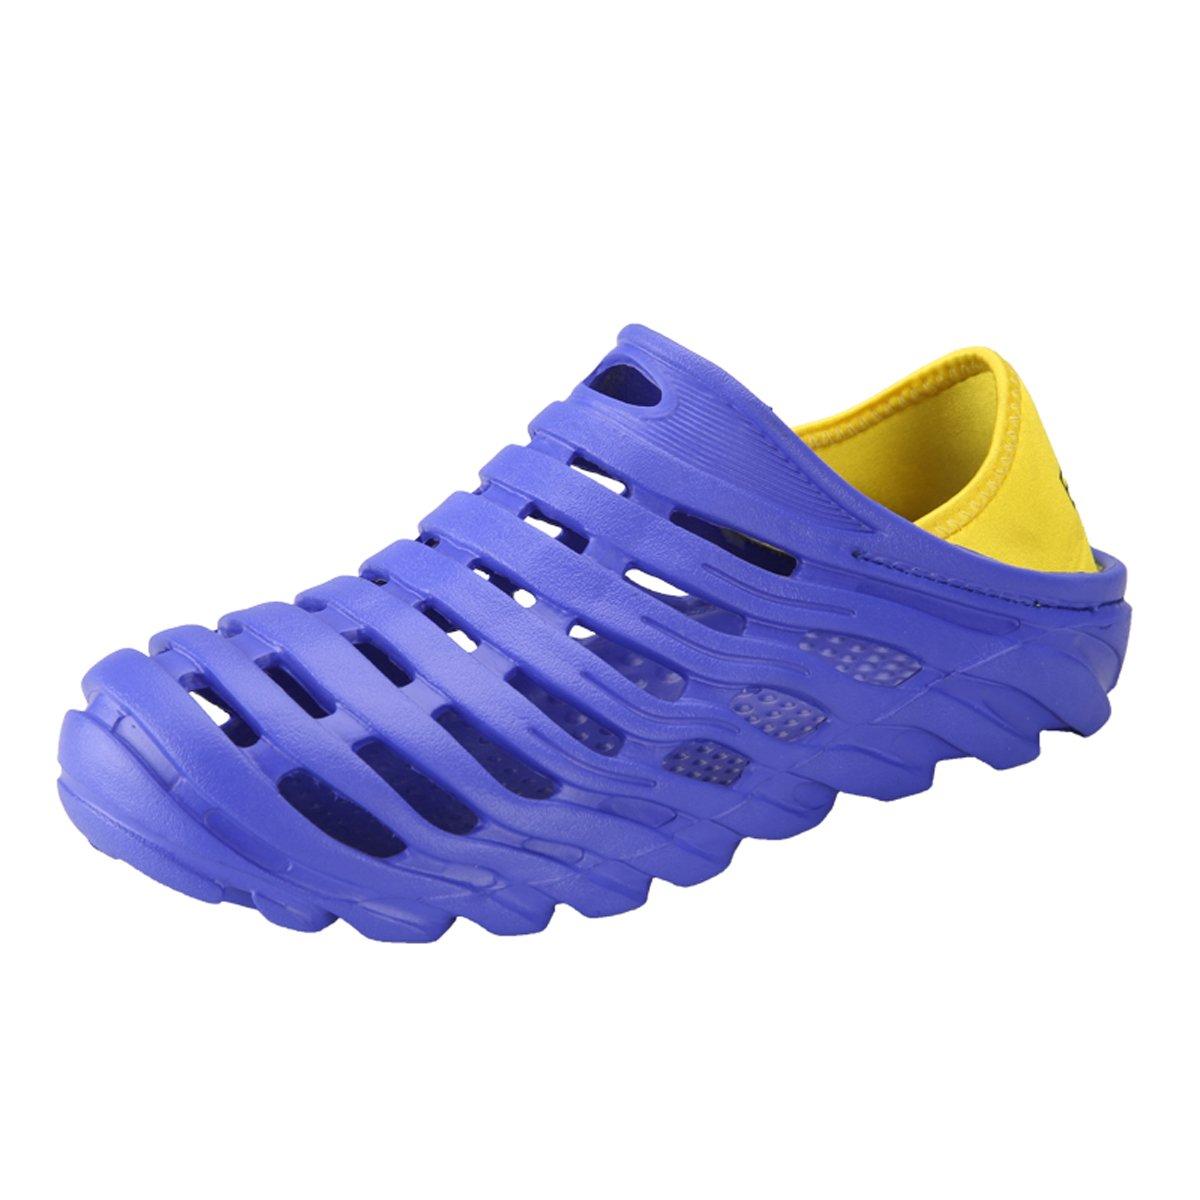 Garden Clogs Shoes Men's Ultralight Hollow Summer Aqua Breathable Comfort Slippers Outdoor Unisex Water Shoes Blue 43